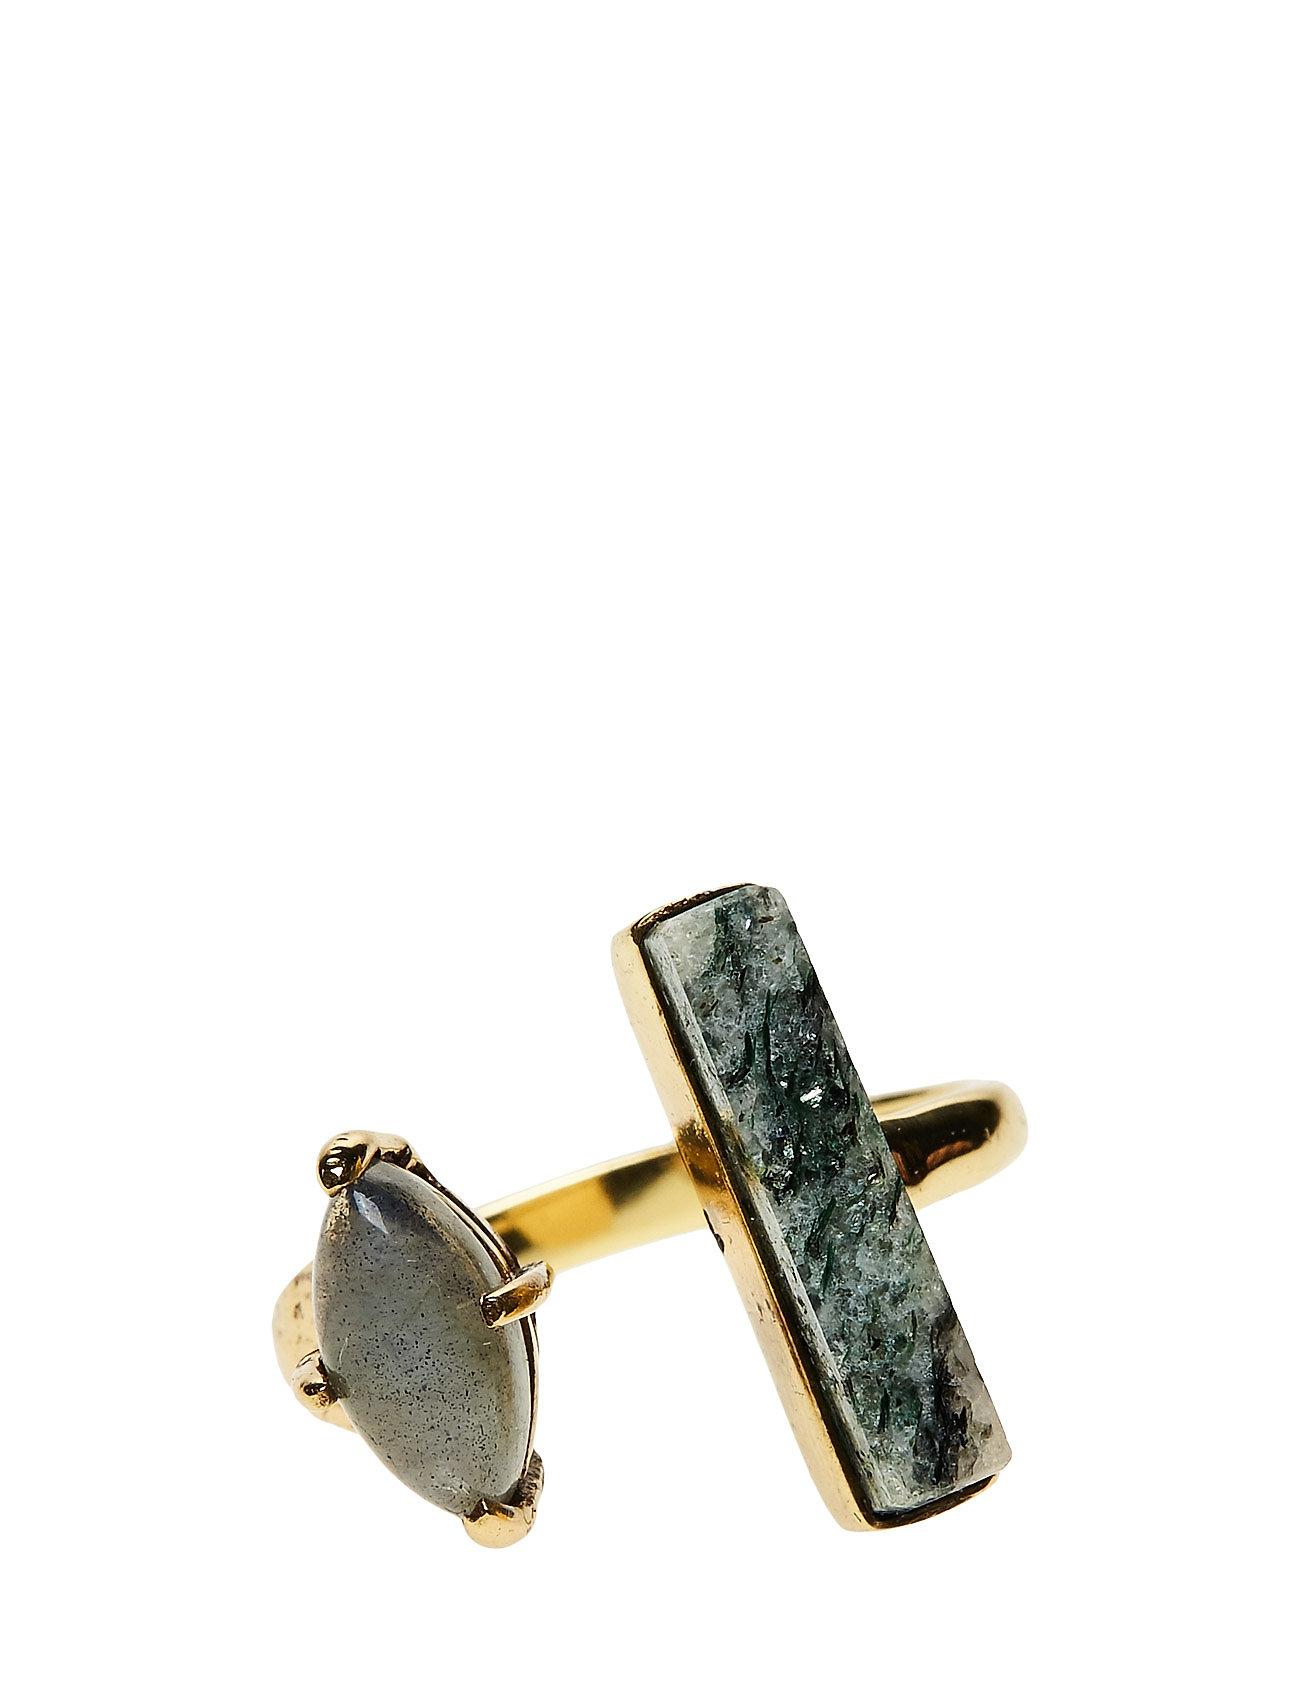 Stoned Open Ring Small Cornelia Webb Smycken